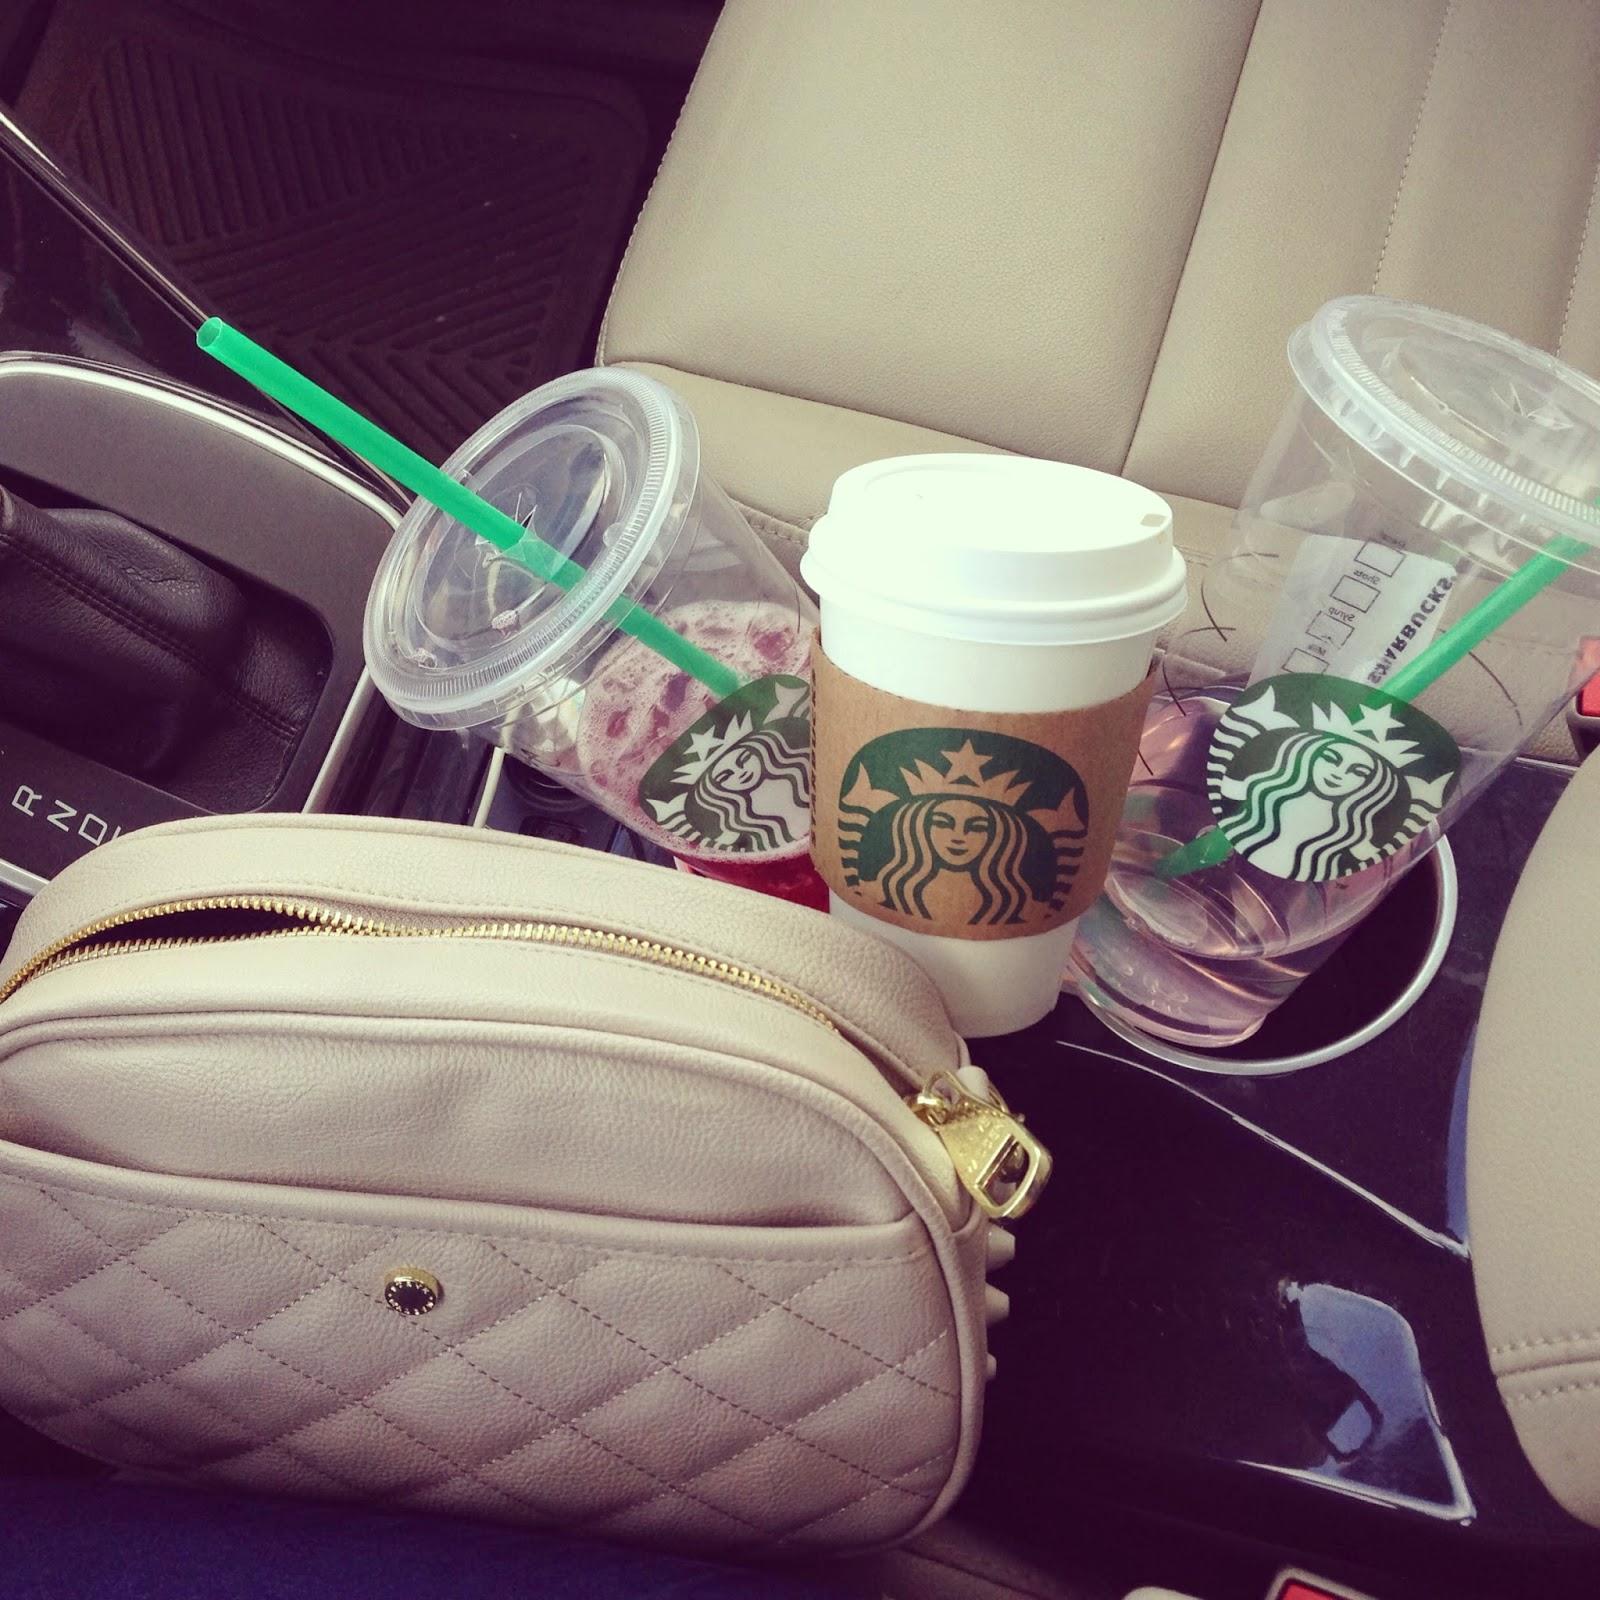 starbucks, white girl problems, instagram, starbucks addiction, natalie craig, natalie in the city, fashion blogger, caffine fix, white girl probs, car